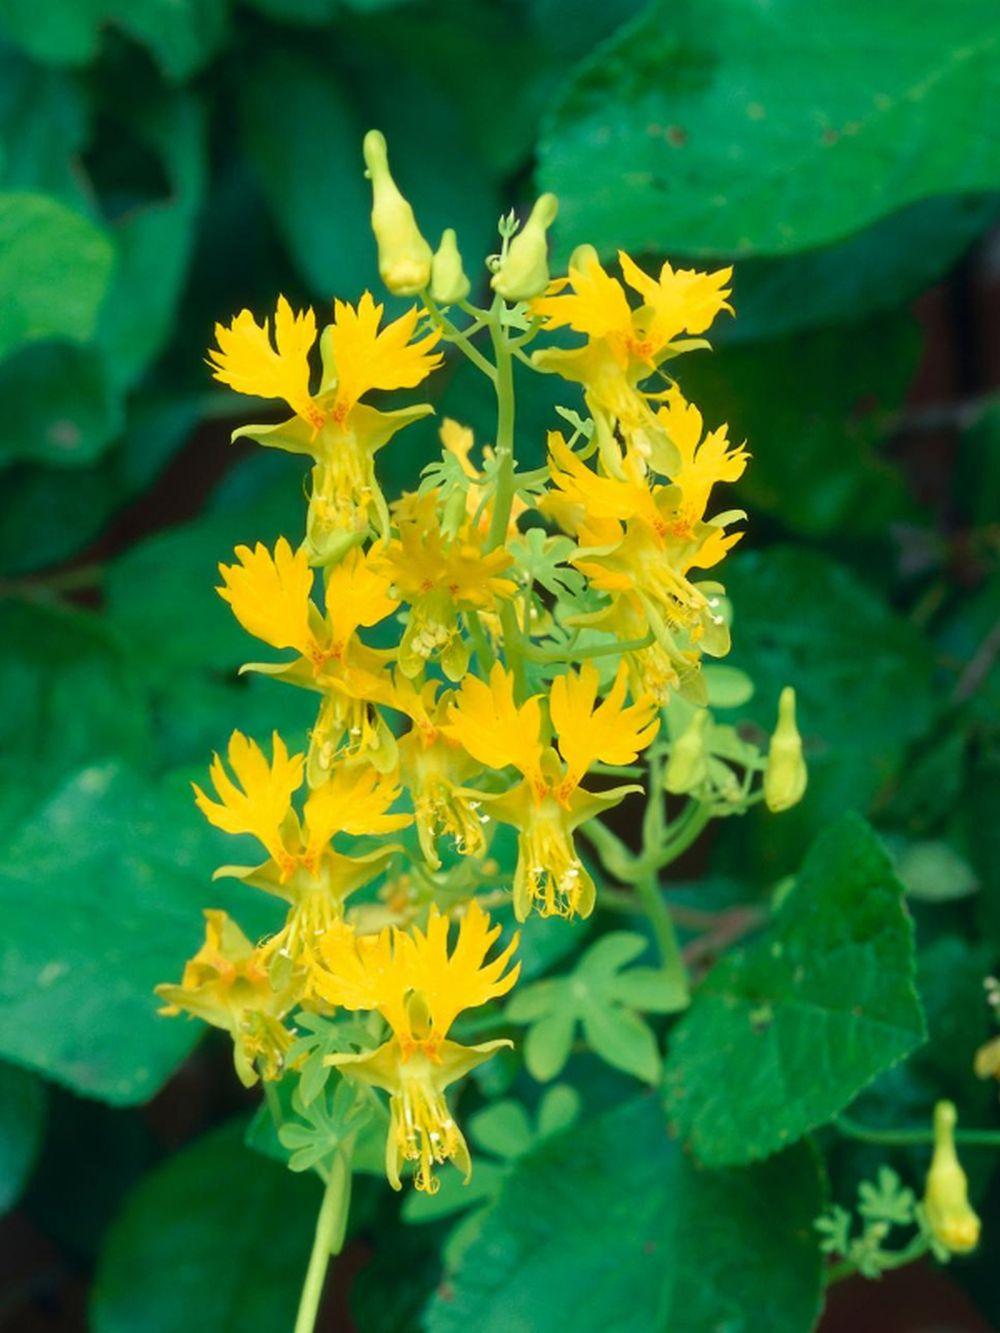 adelaparvu.com top 5 plante cataratoare, Text Carli Marian, In foto Tropaeolum Peregrinum (6)